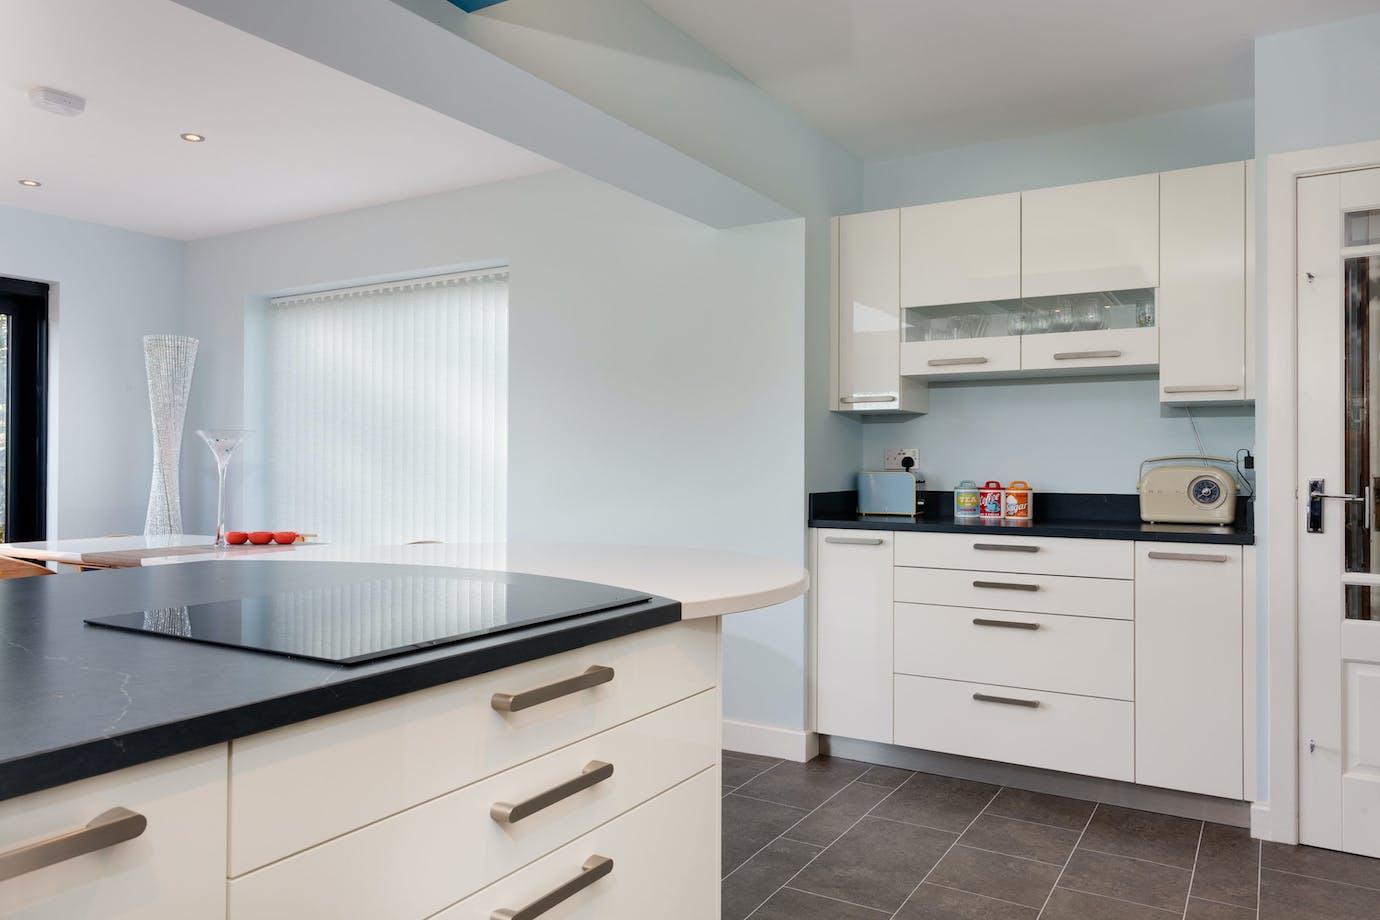 Schuller kitchen in white gloss